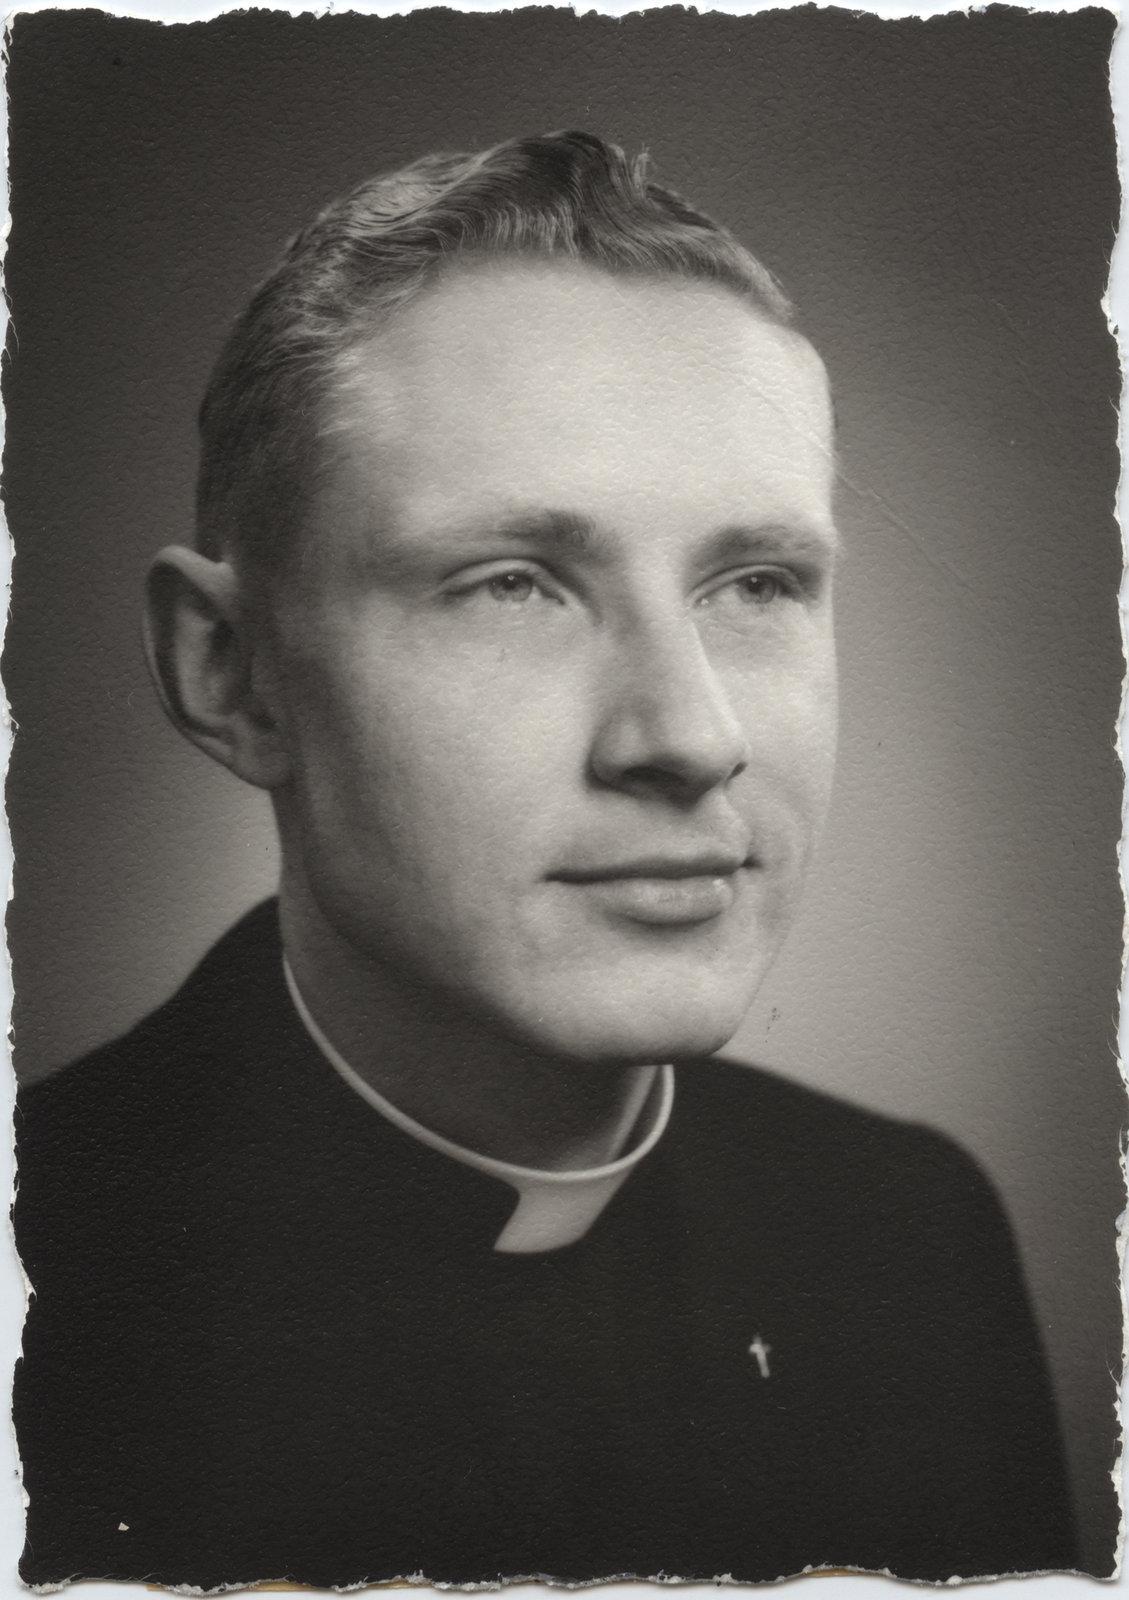 Frederick Haak